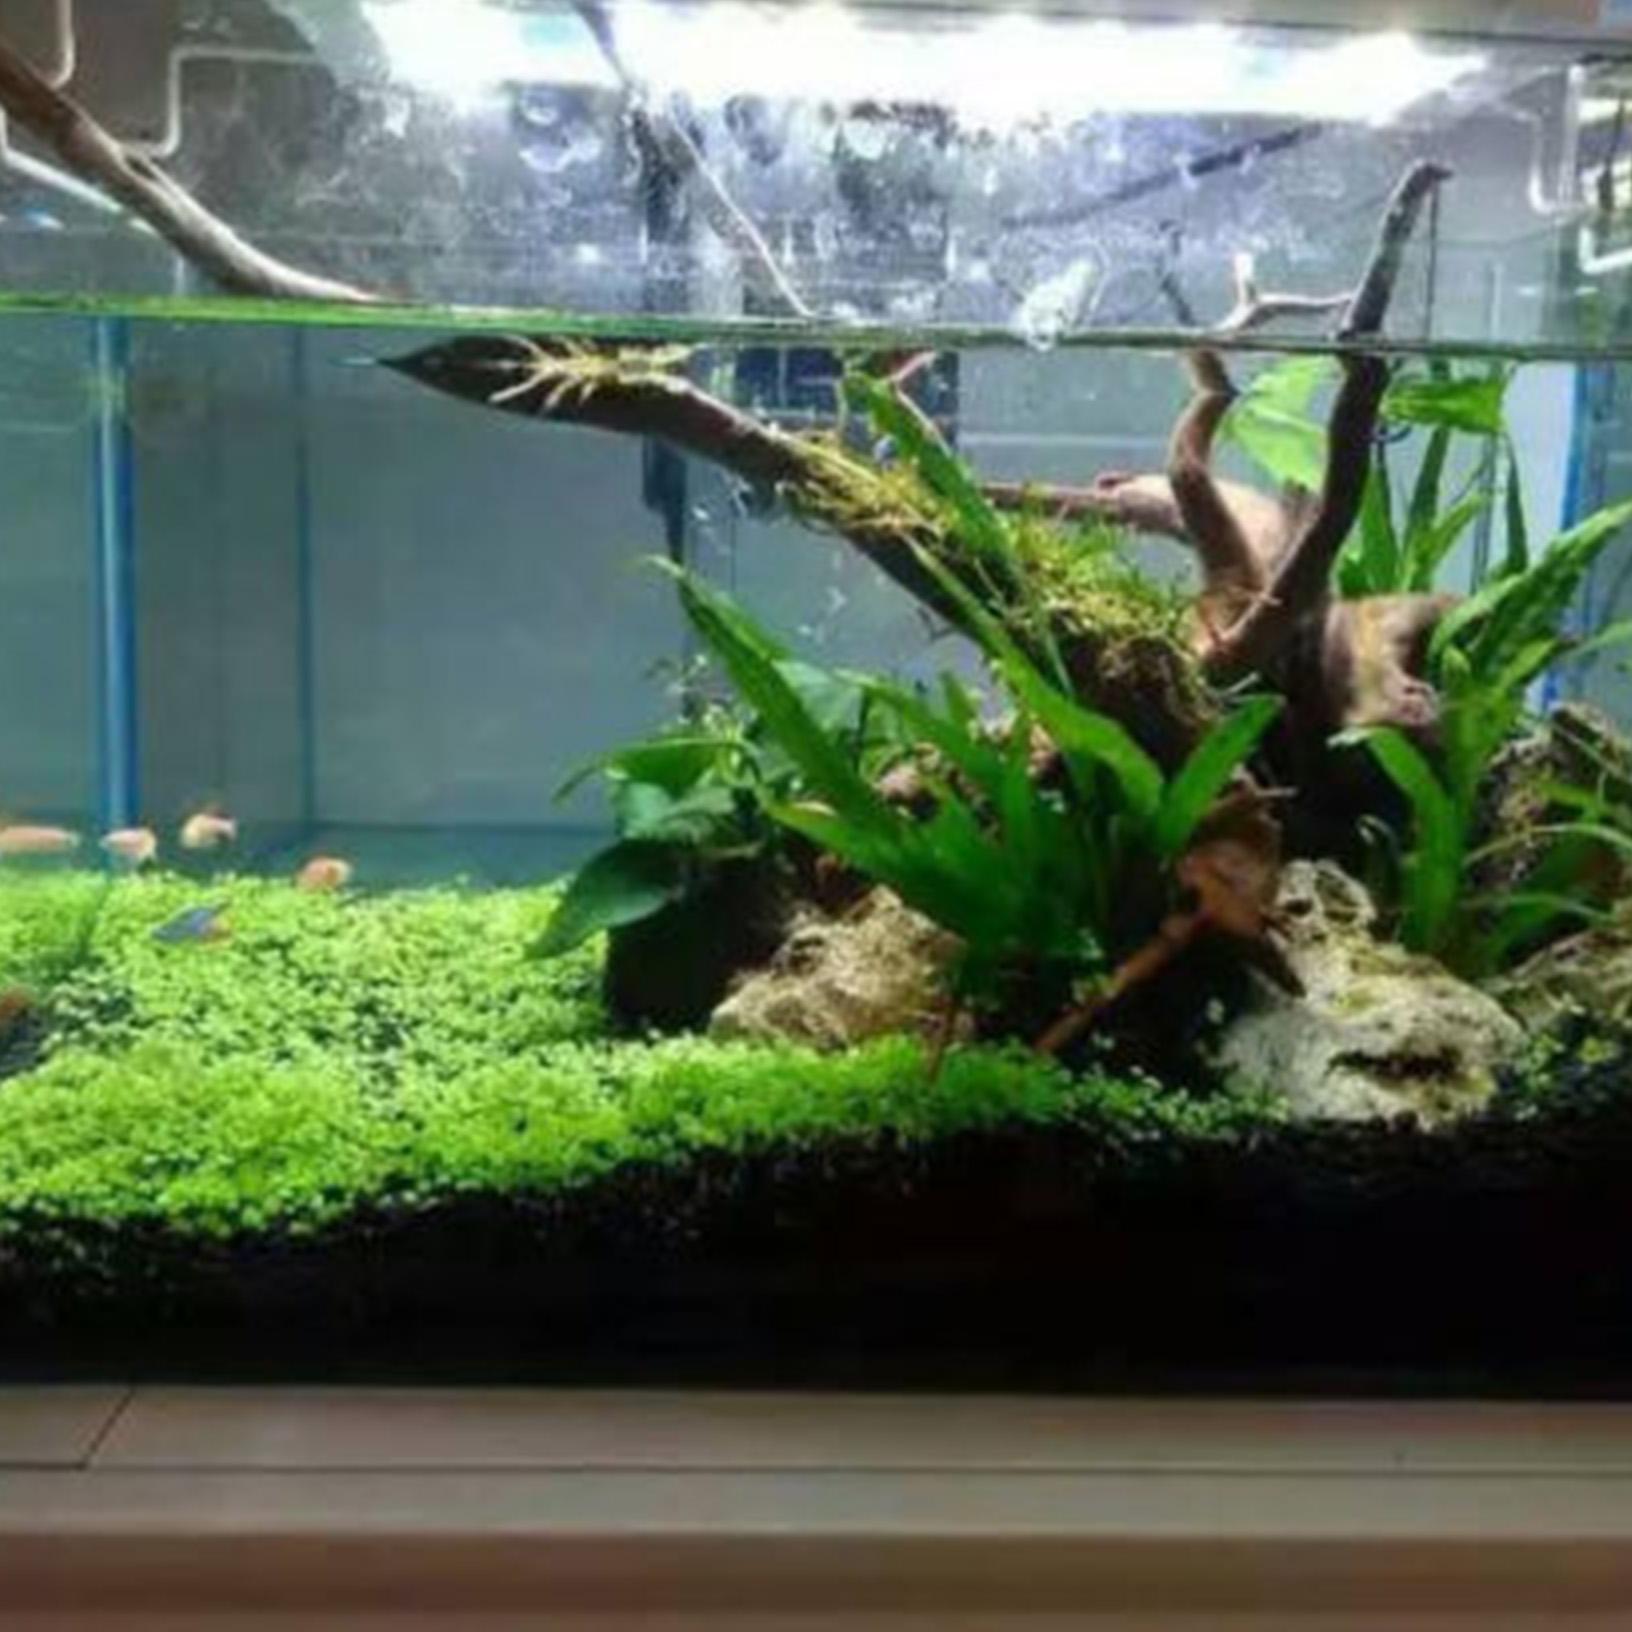 Fish tank aquarium plant decor seed cute aquatic double for Aquarium plant decoration